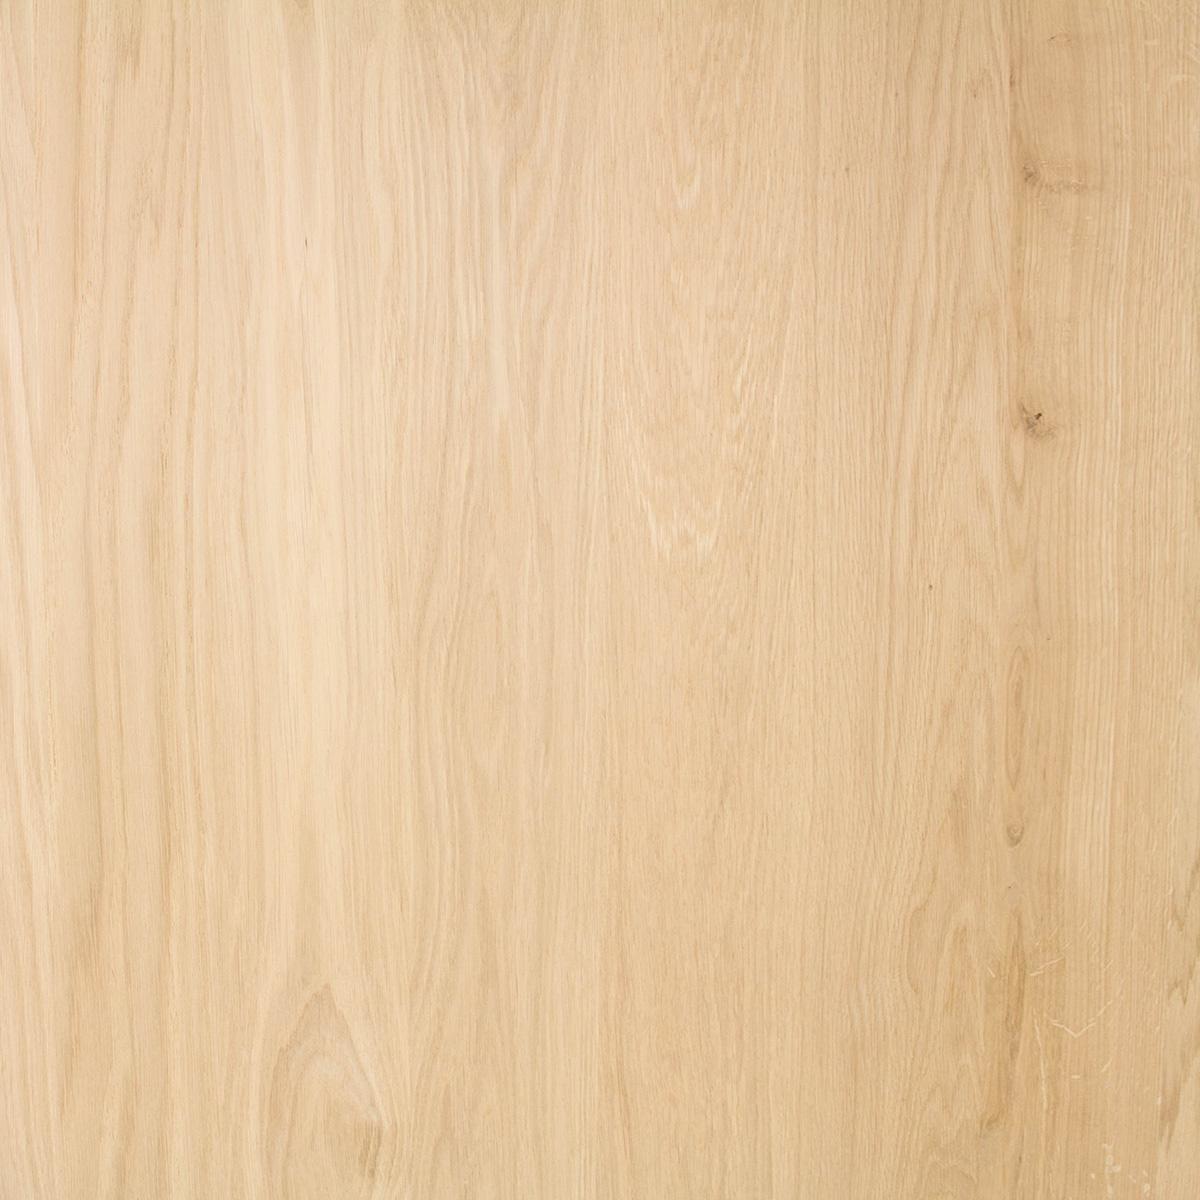 Eiken paneel foutvrij 4 cm - 122 cm breed - vaste lengtestaffels - Meubelblad 8-12% kd Europees eikenhout